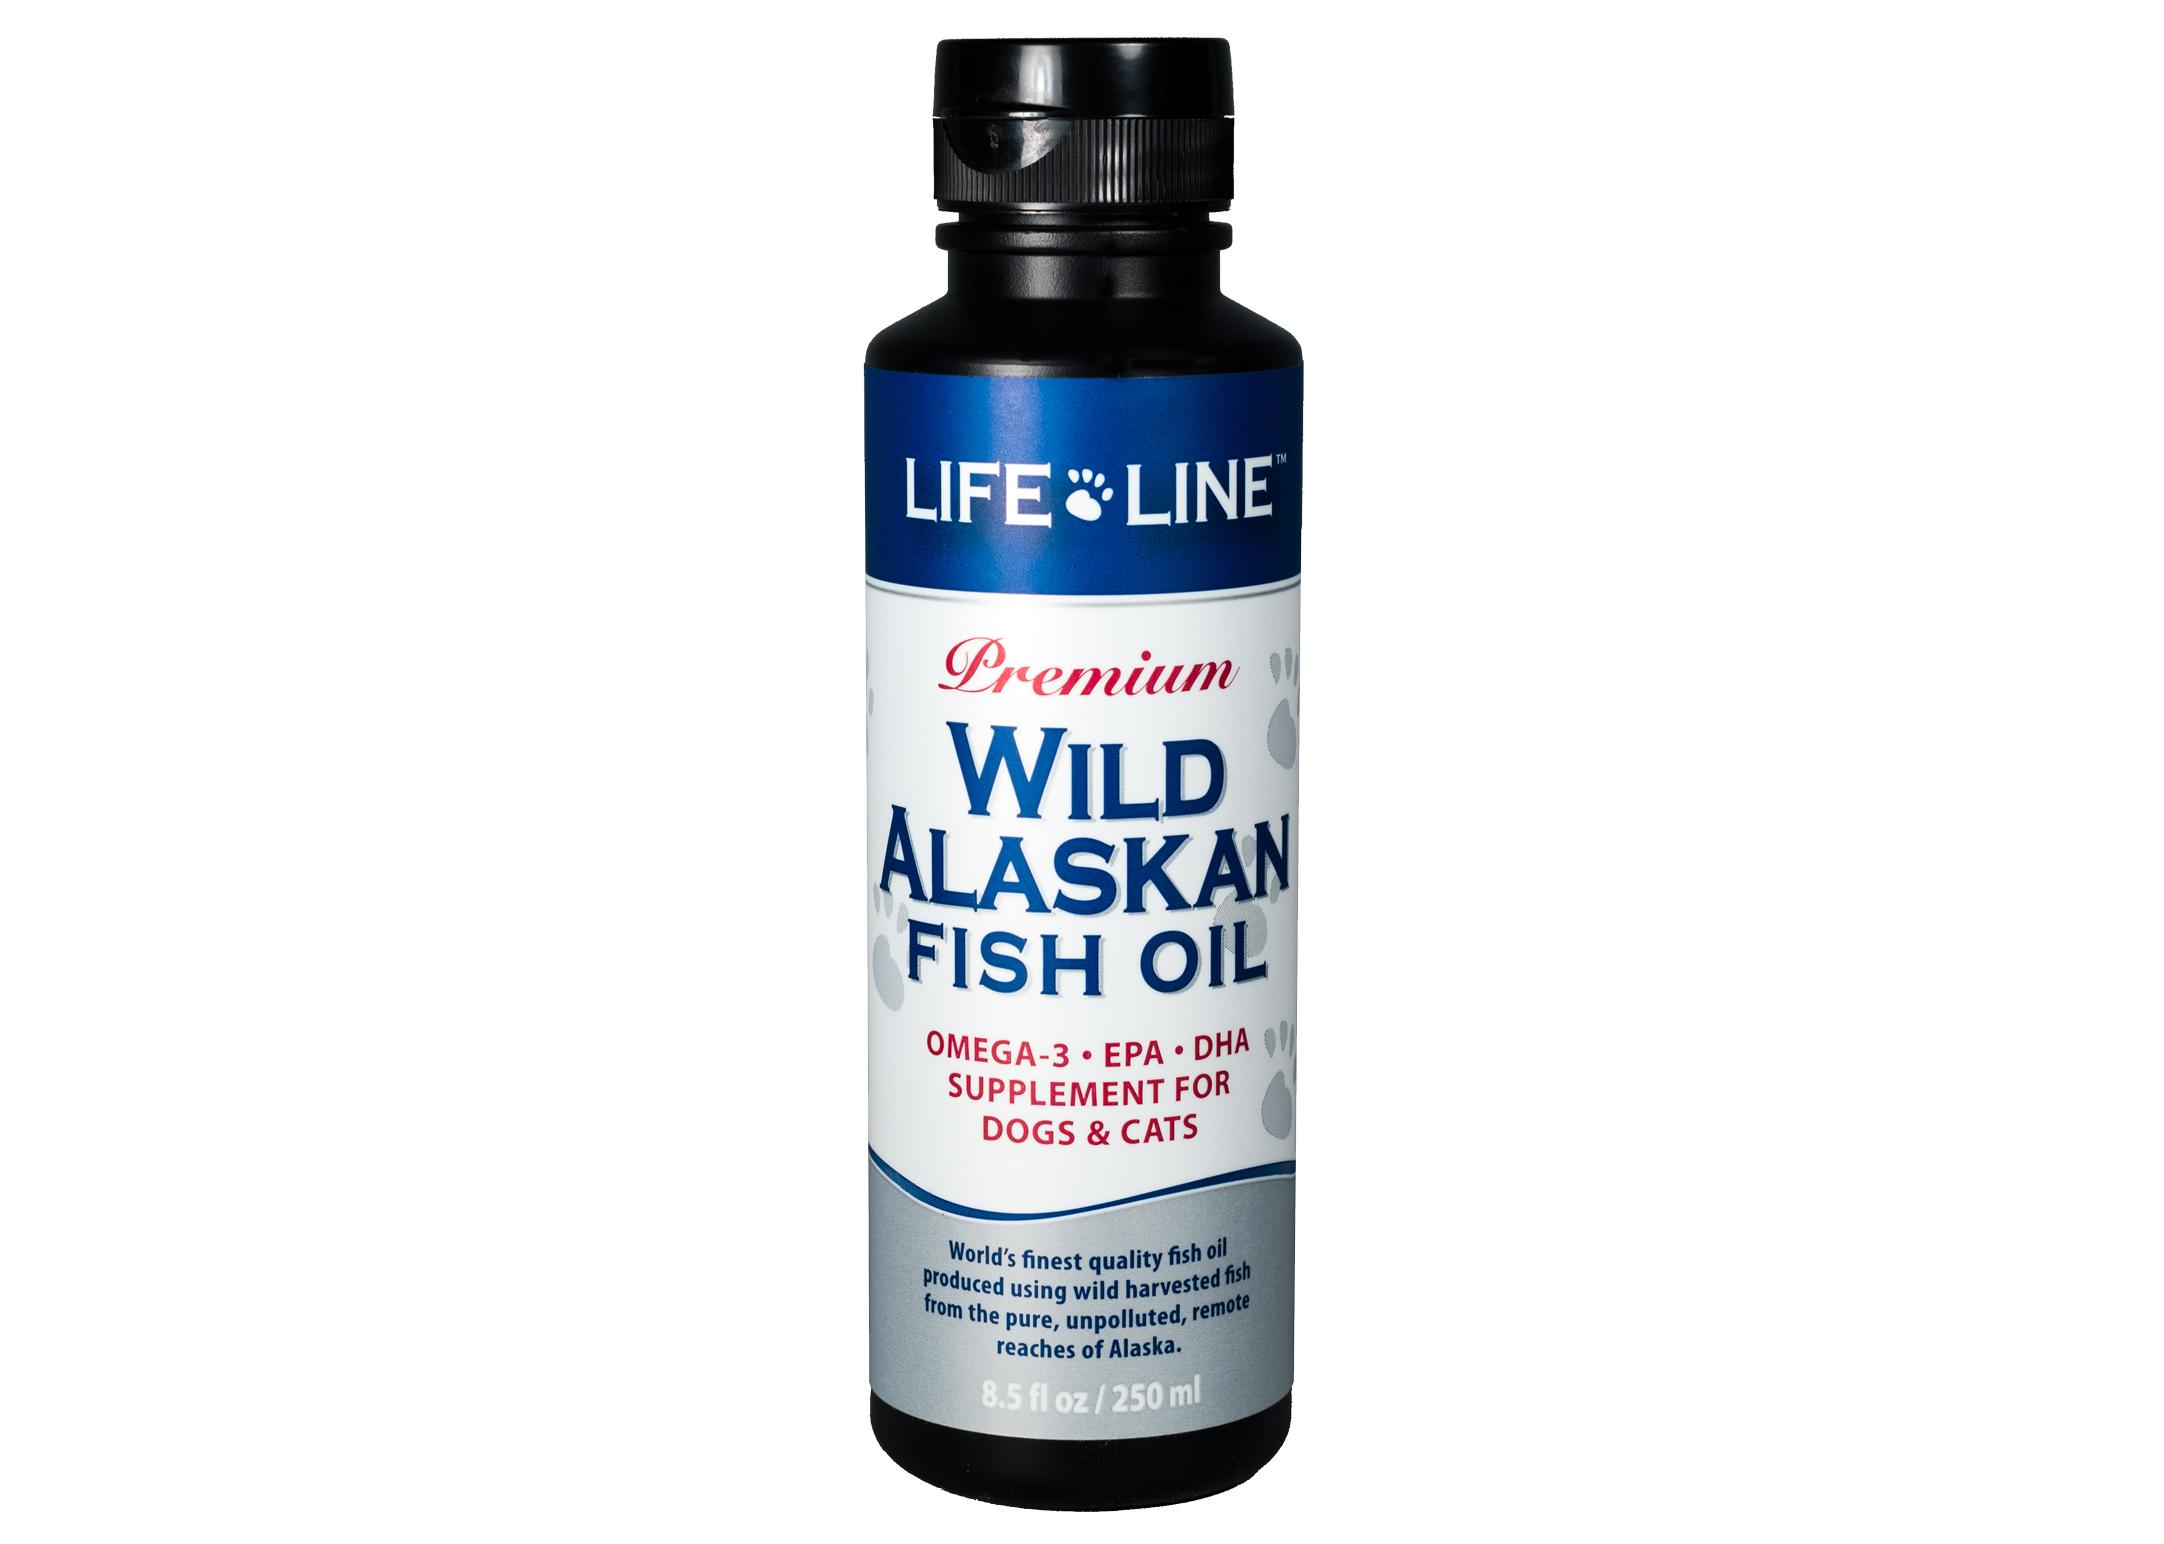 Life Line Wild Alaskan huile de poisson 250g